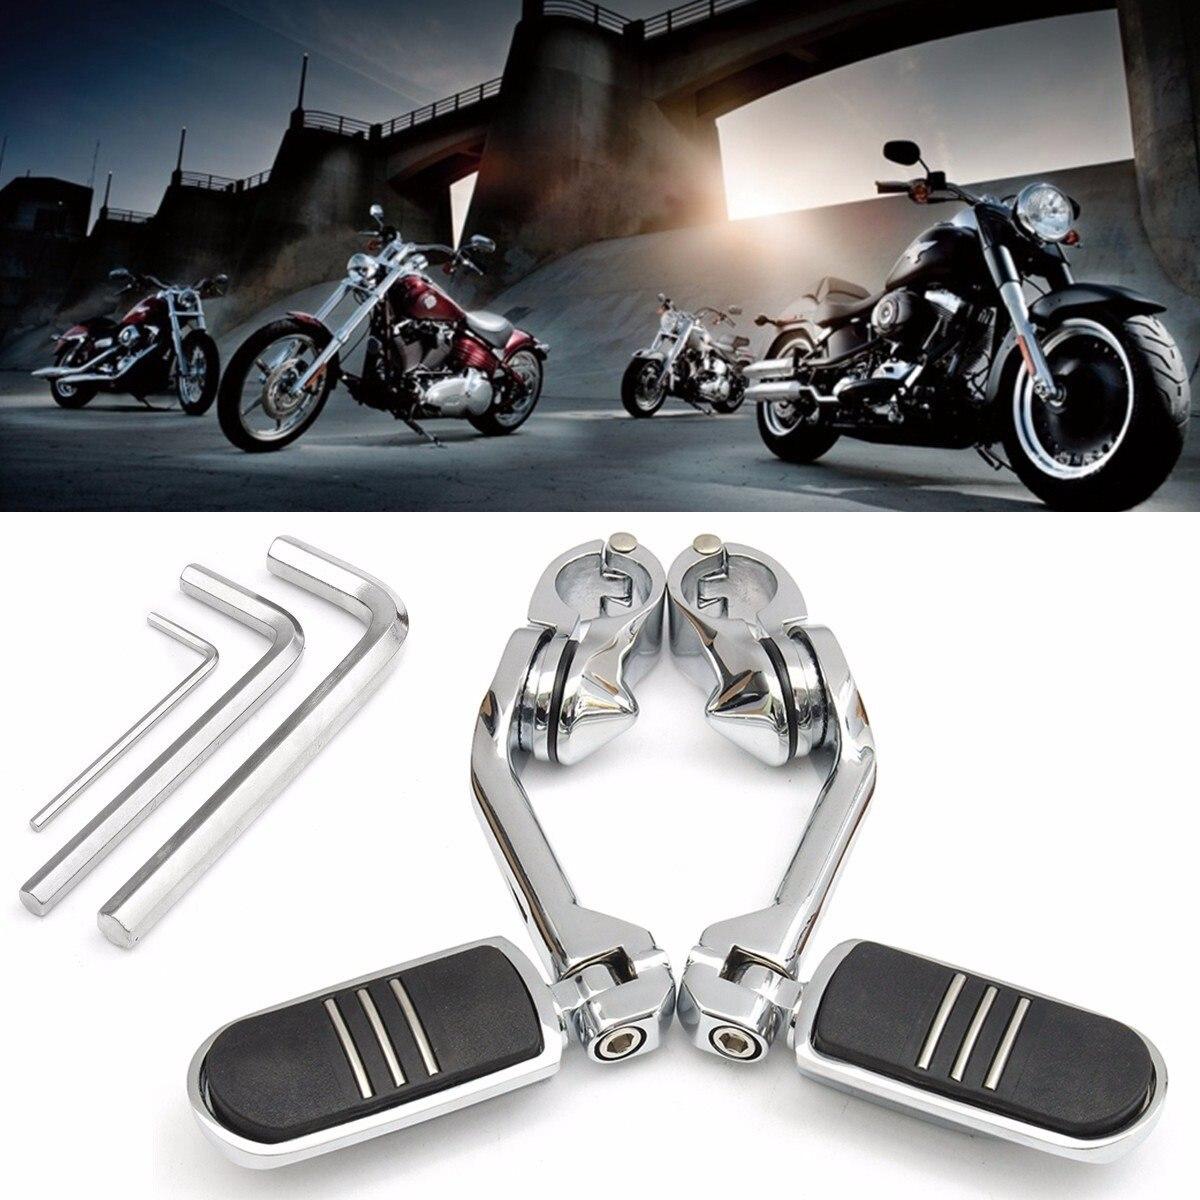 32mm 1 25 Long Adjustable Chrome Motorcycel Rear Foot Peg Pedals For Harley Davidson